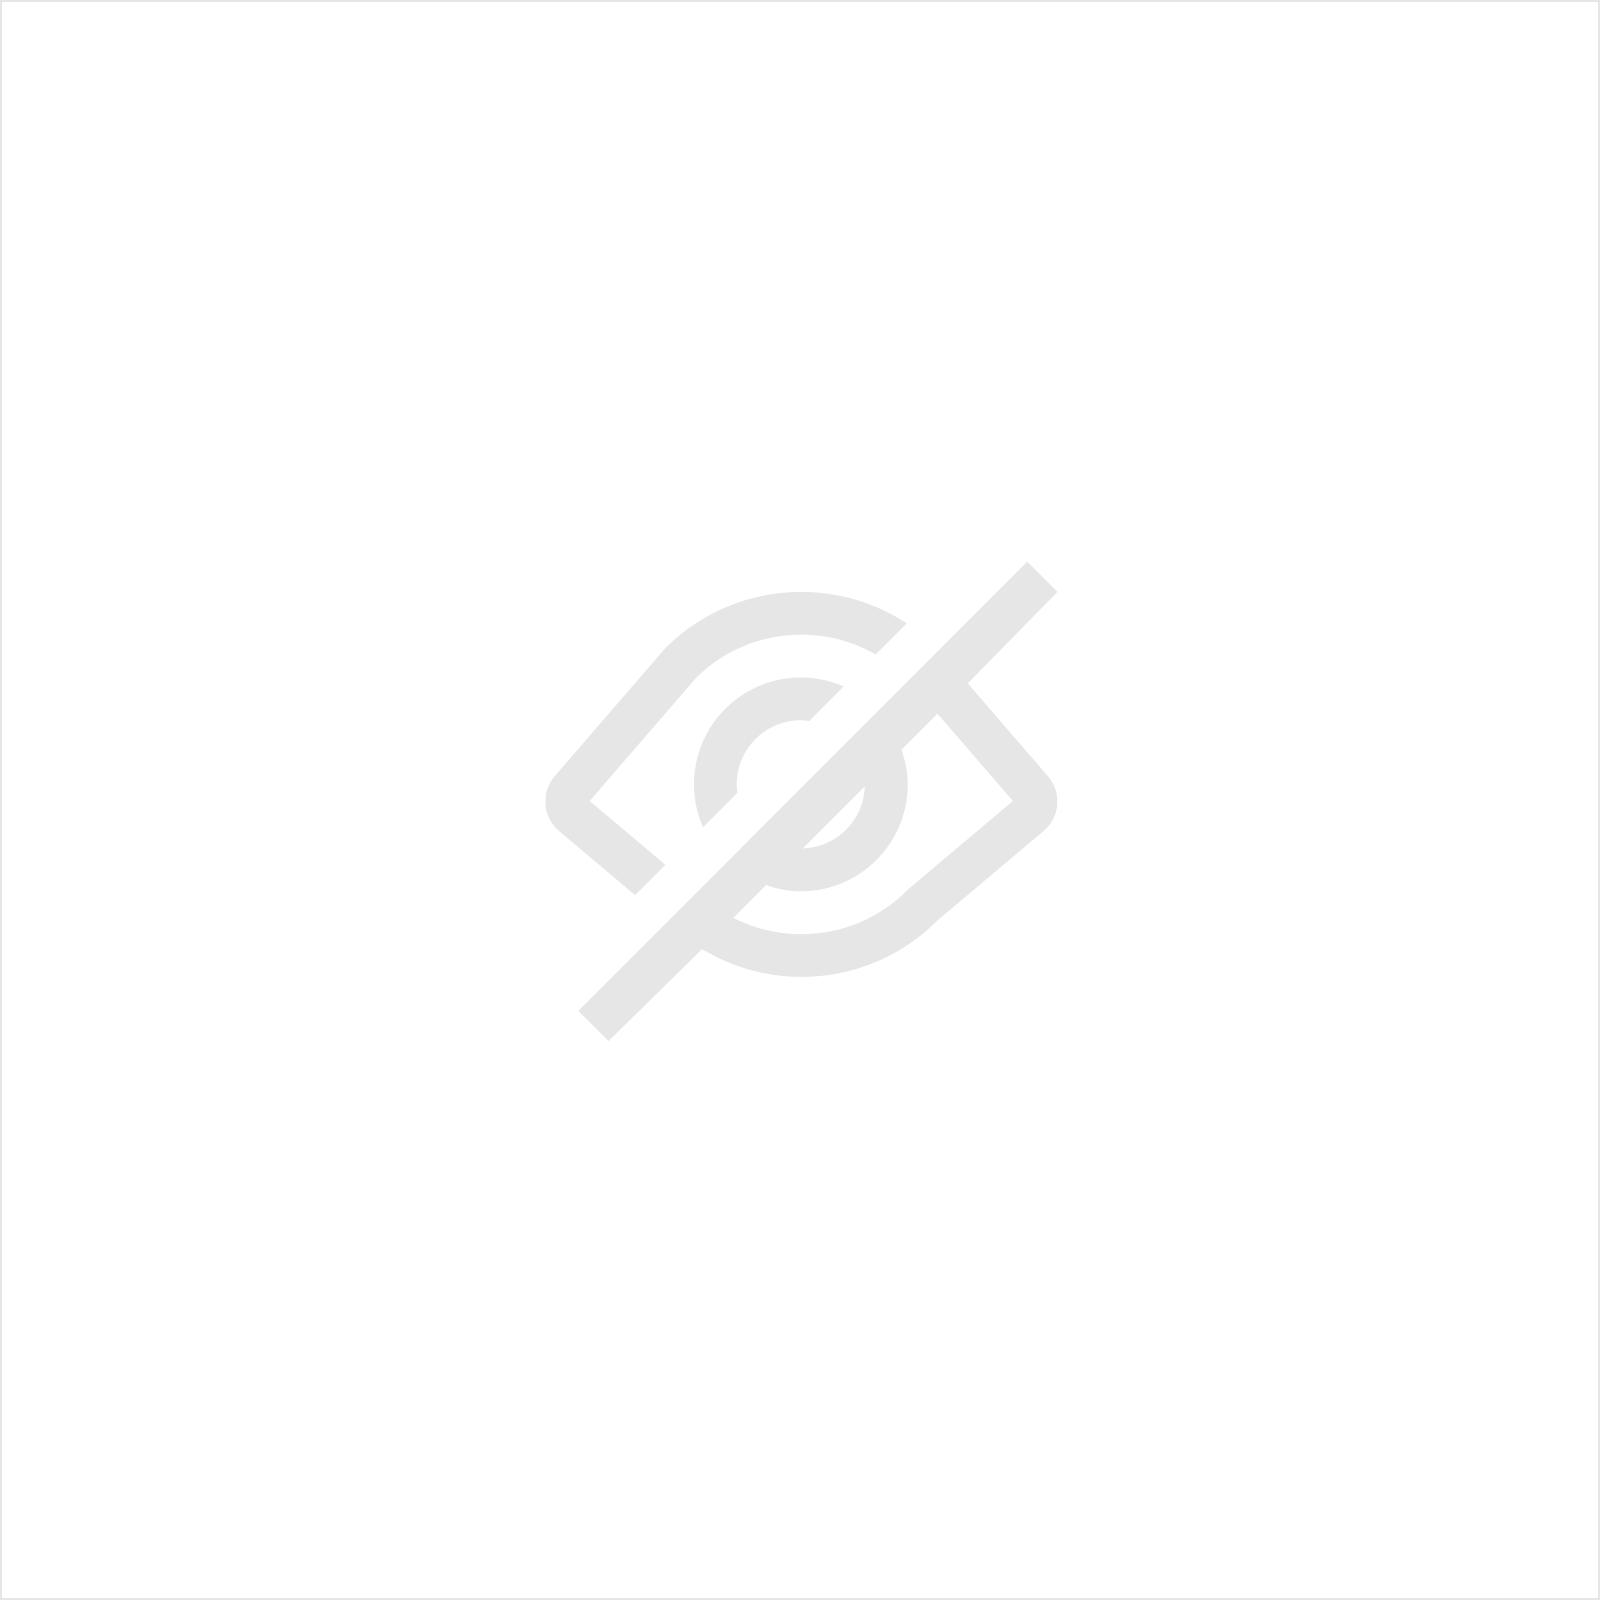 KIT DE RACCORDEMENT 10M HOBBYBLASTER CABINE-SABLEUSE / COMPRESSEUR